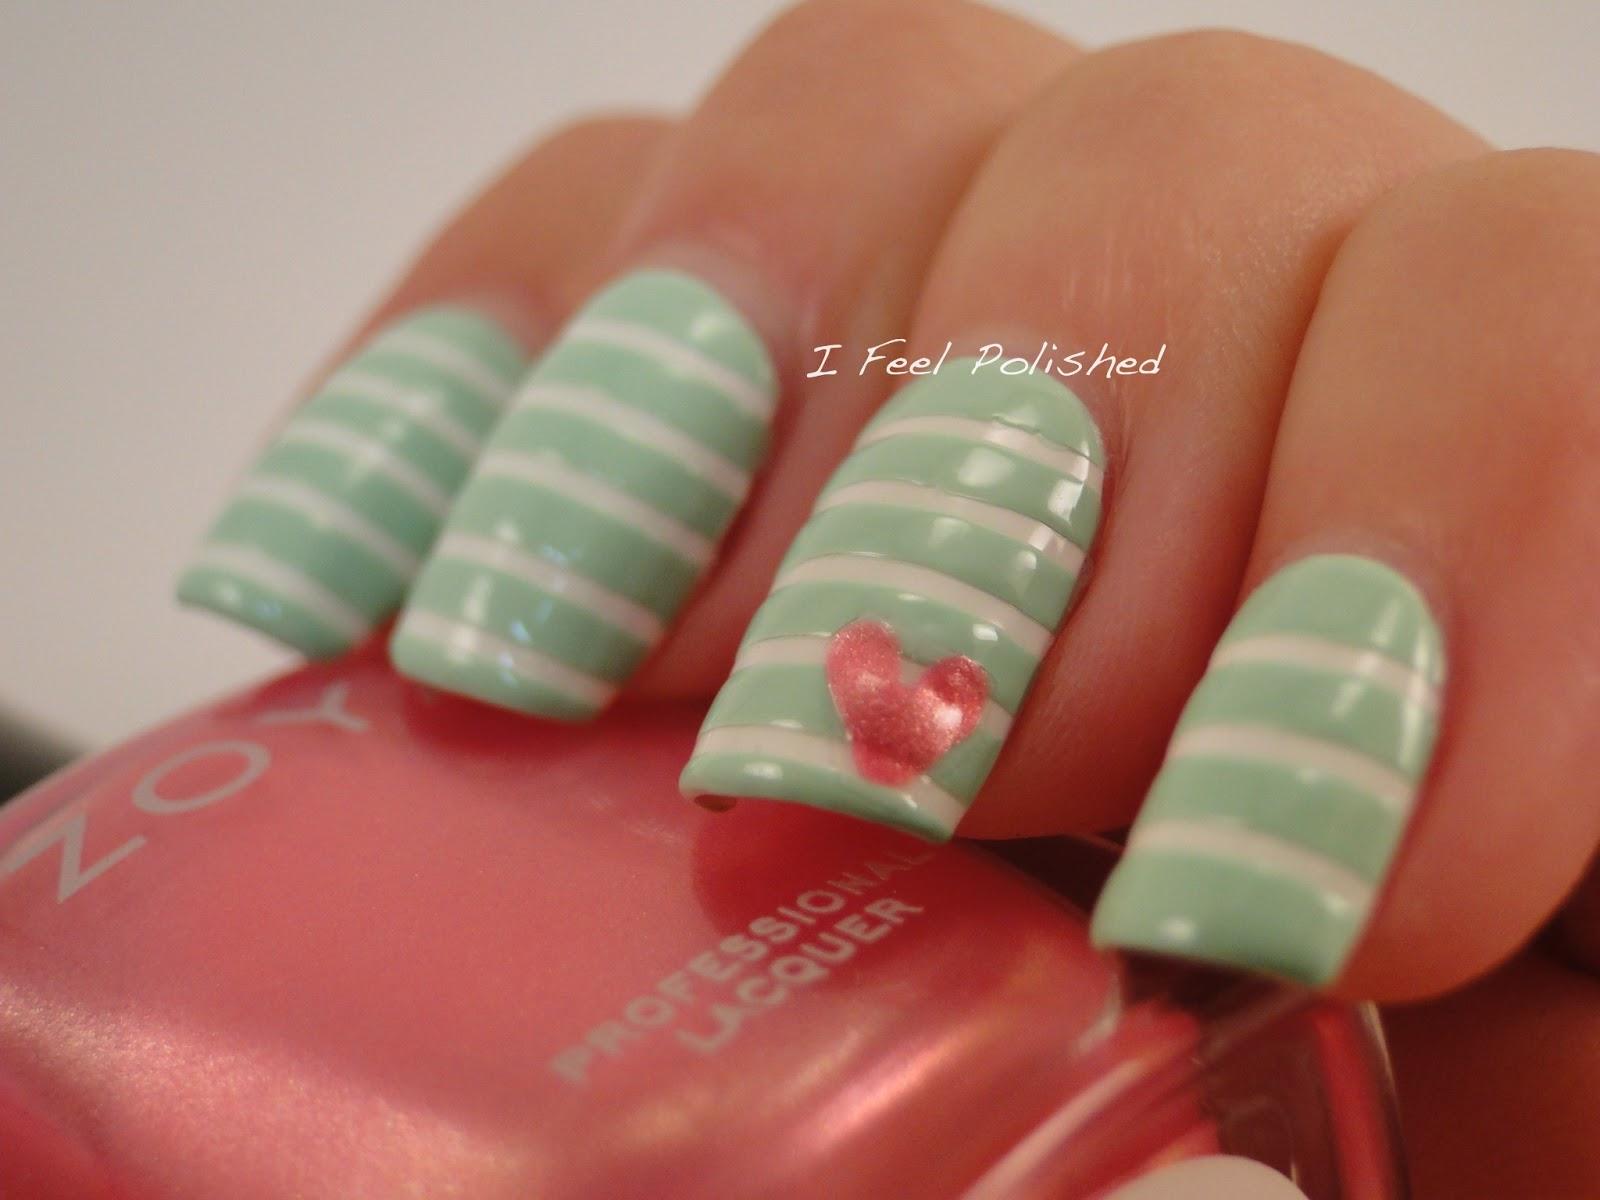 I feel polished mint manis for talia joy mint manicure prinsesfo Choice Image